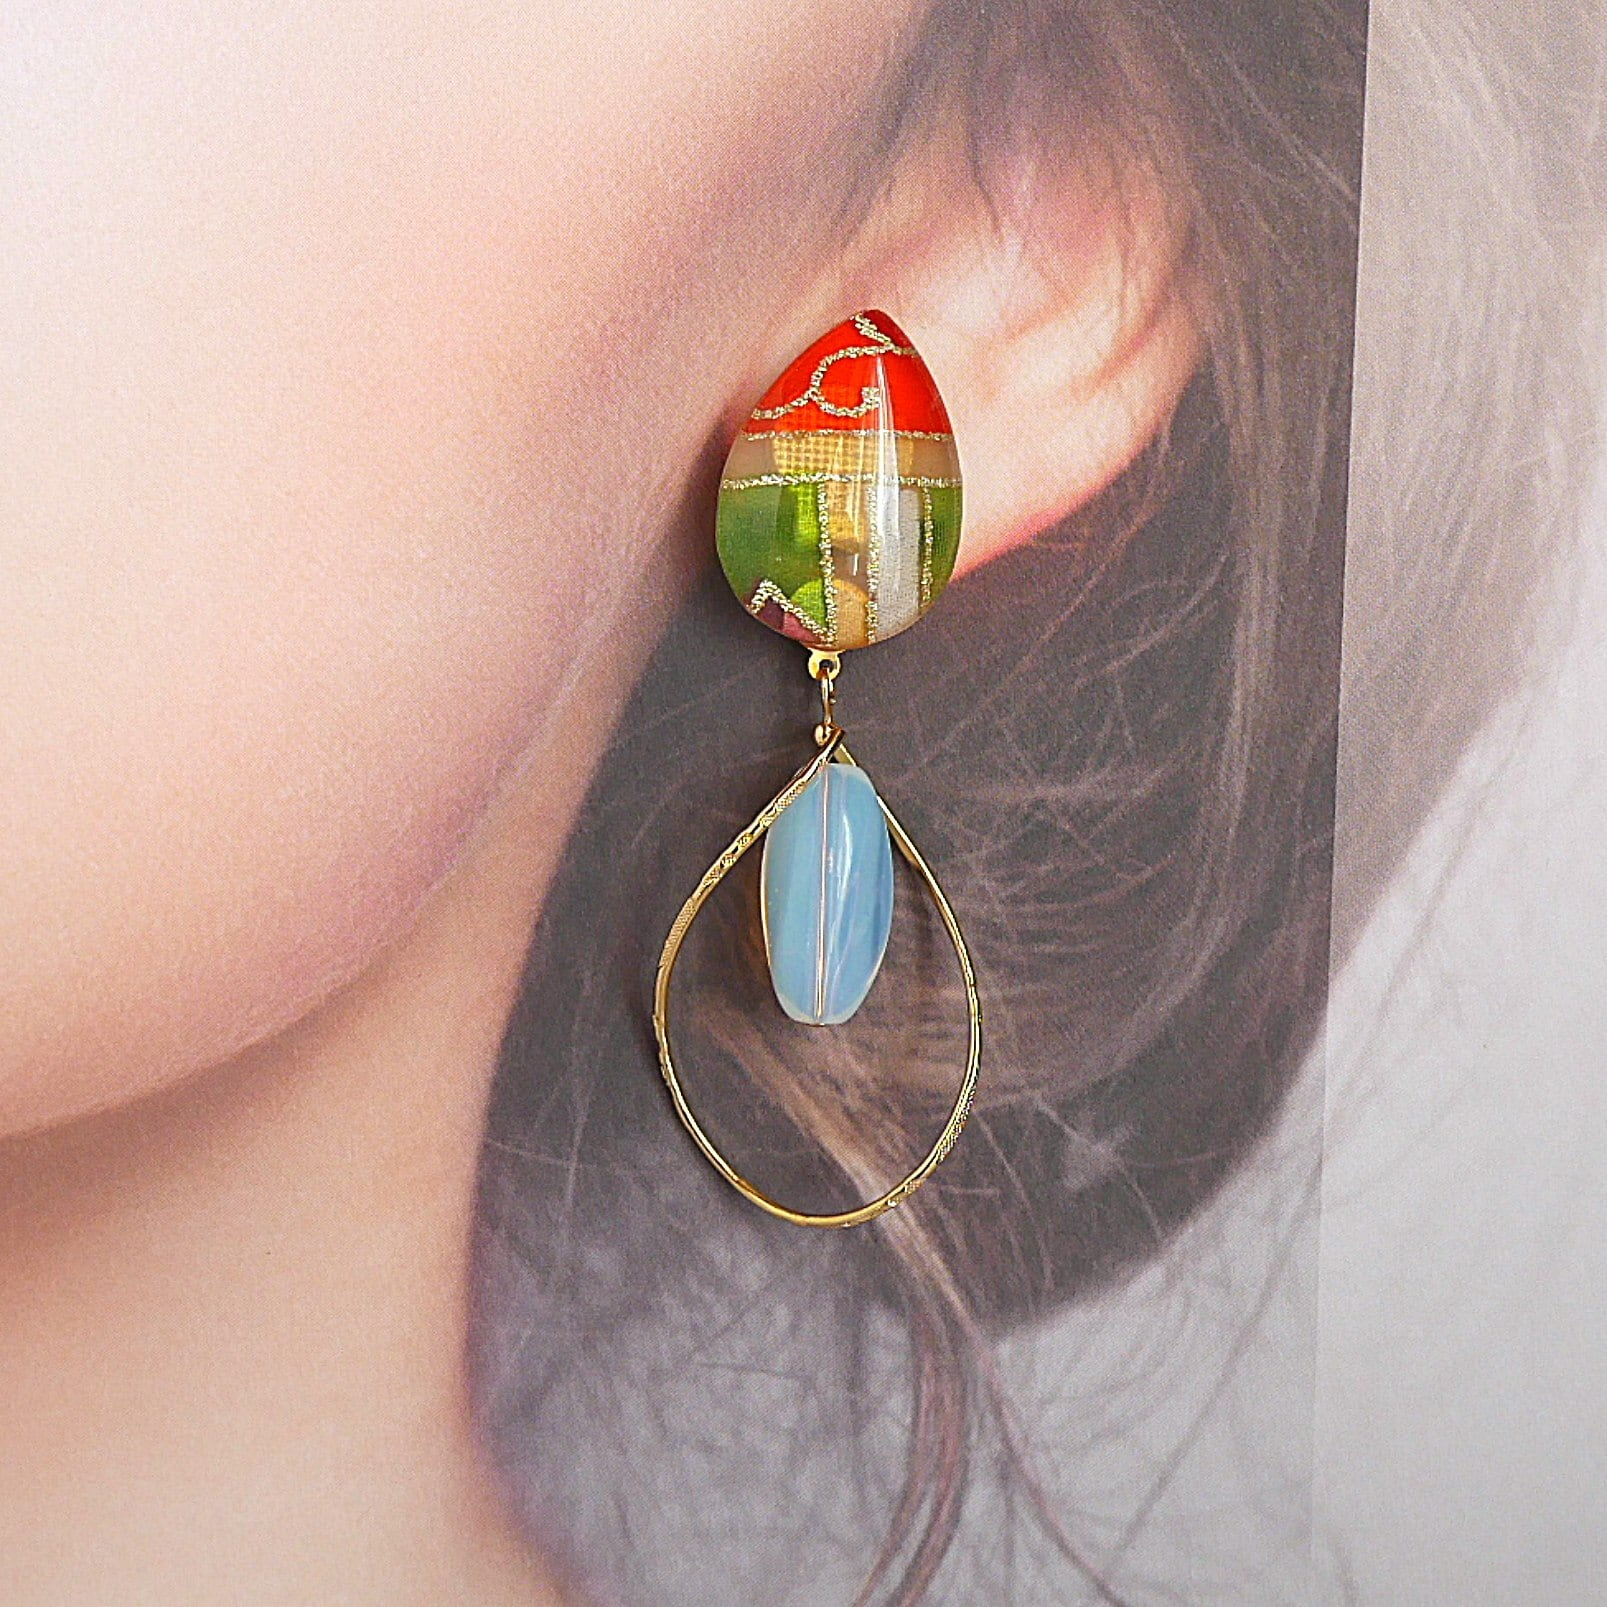 """ Earrings NO.0-1959″カラフル着物とミルキークオーツ"